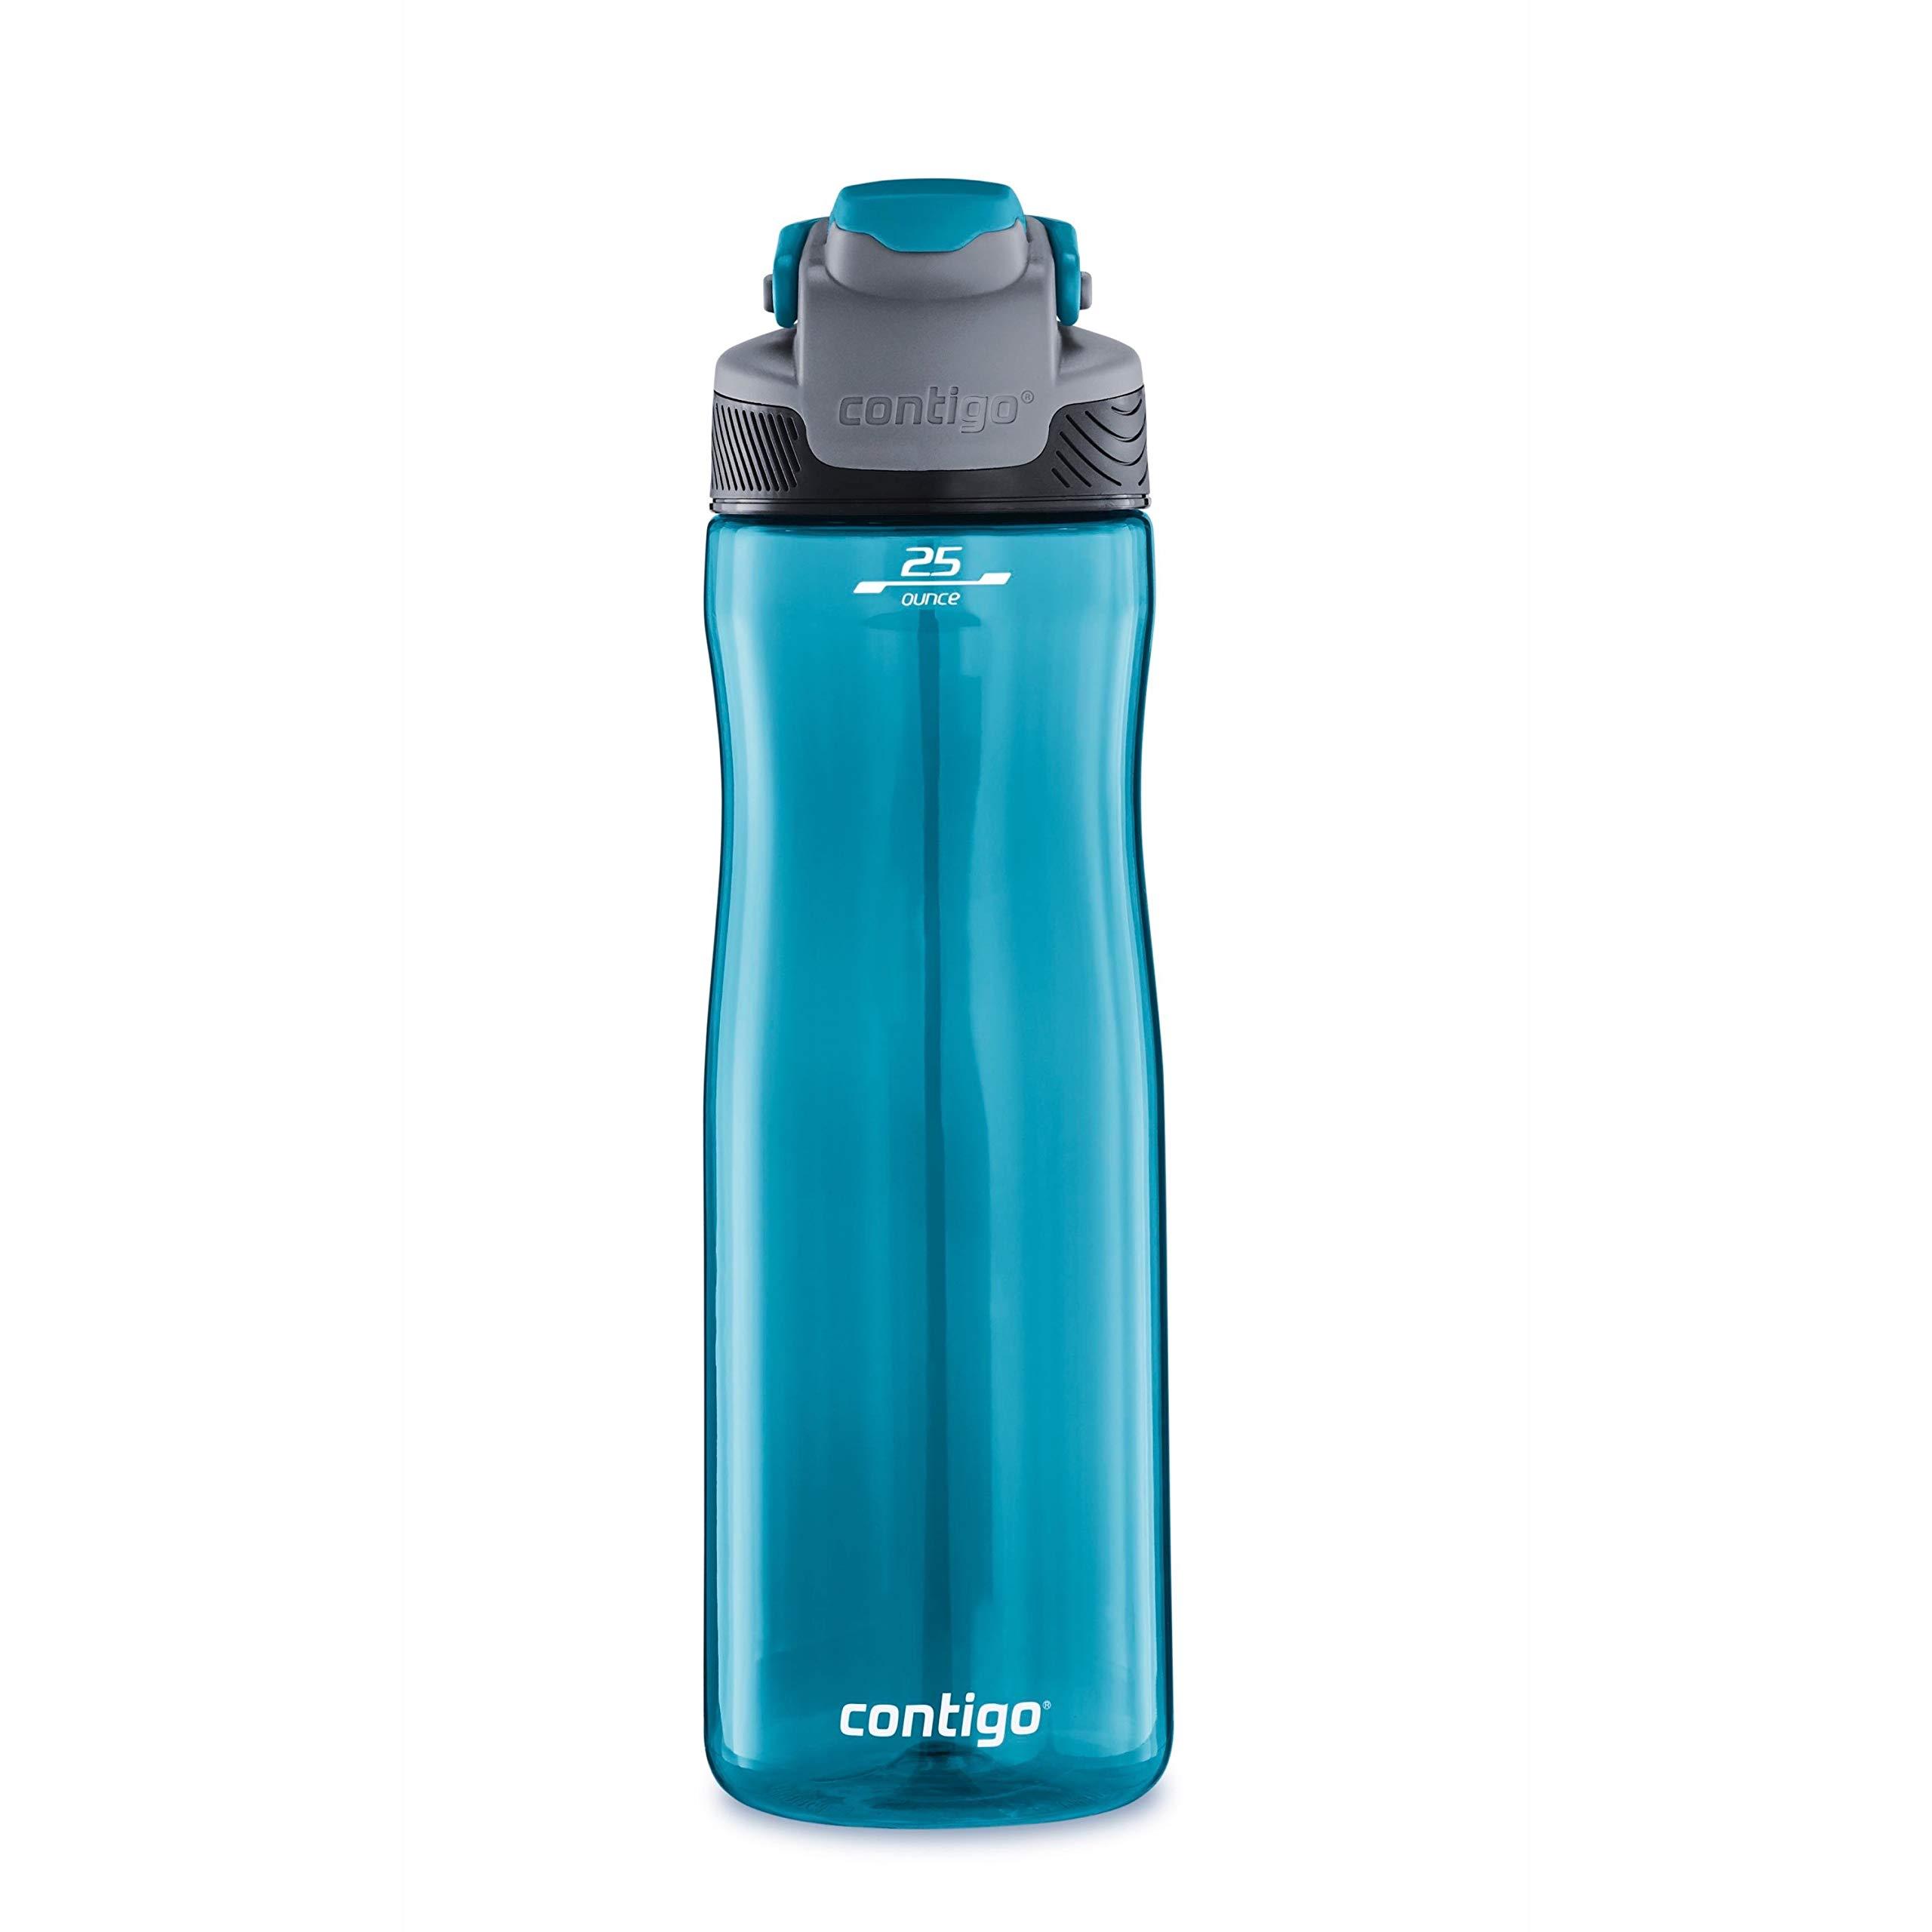 Contigo AUTOSEAL Fit Water Bottle, 25 oz, Juniper,2079450